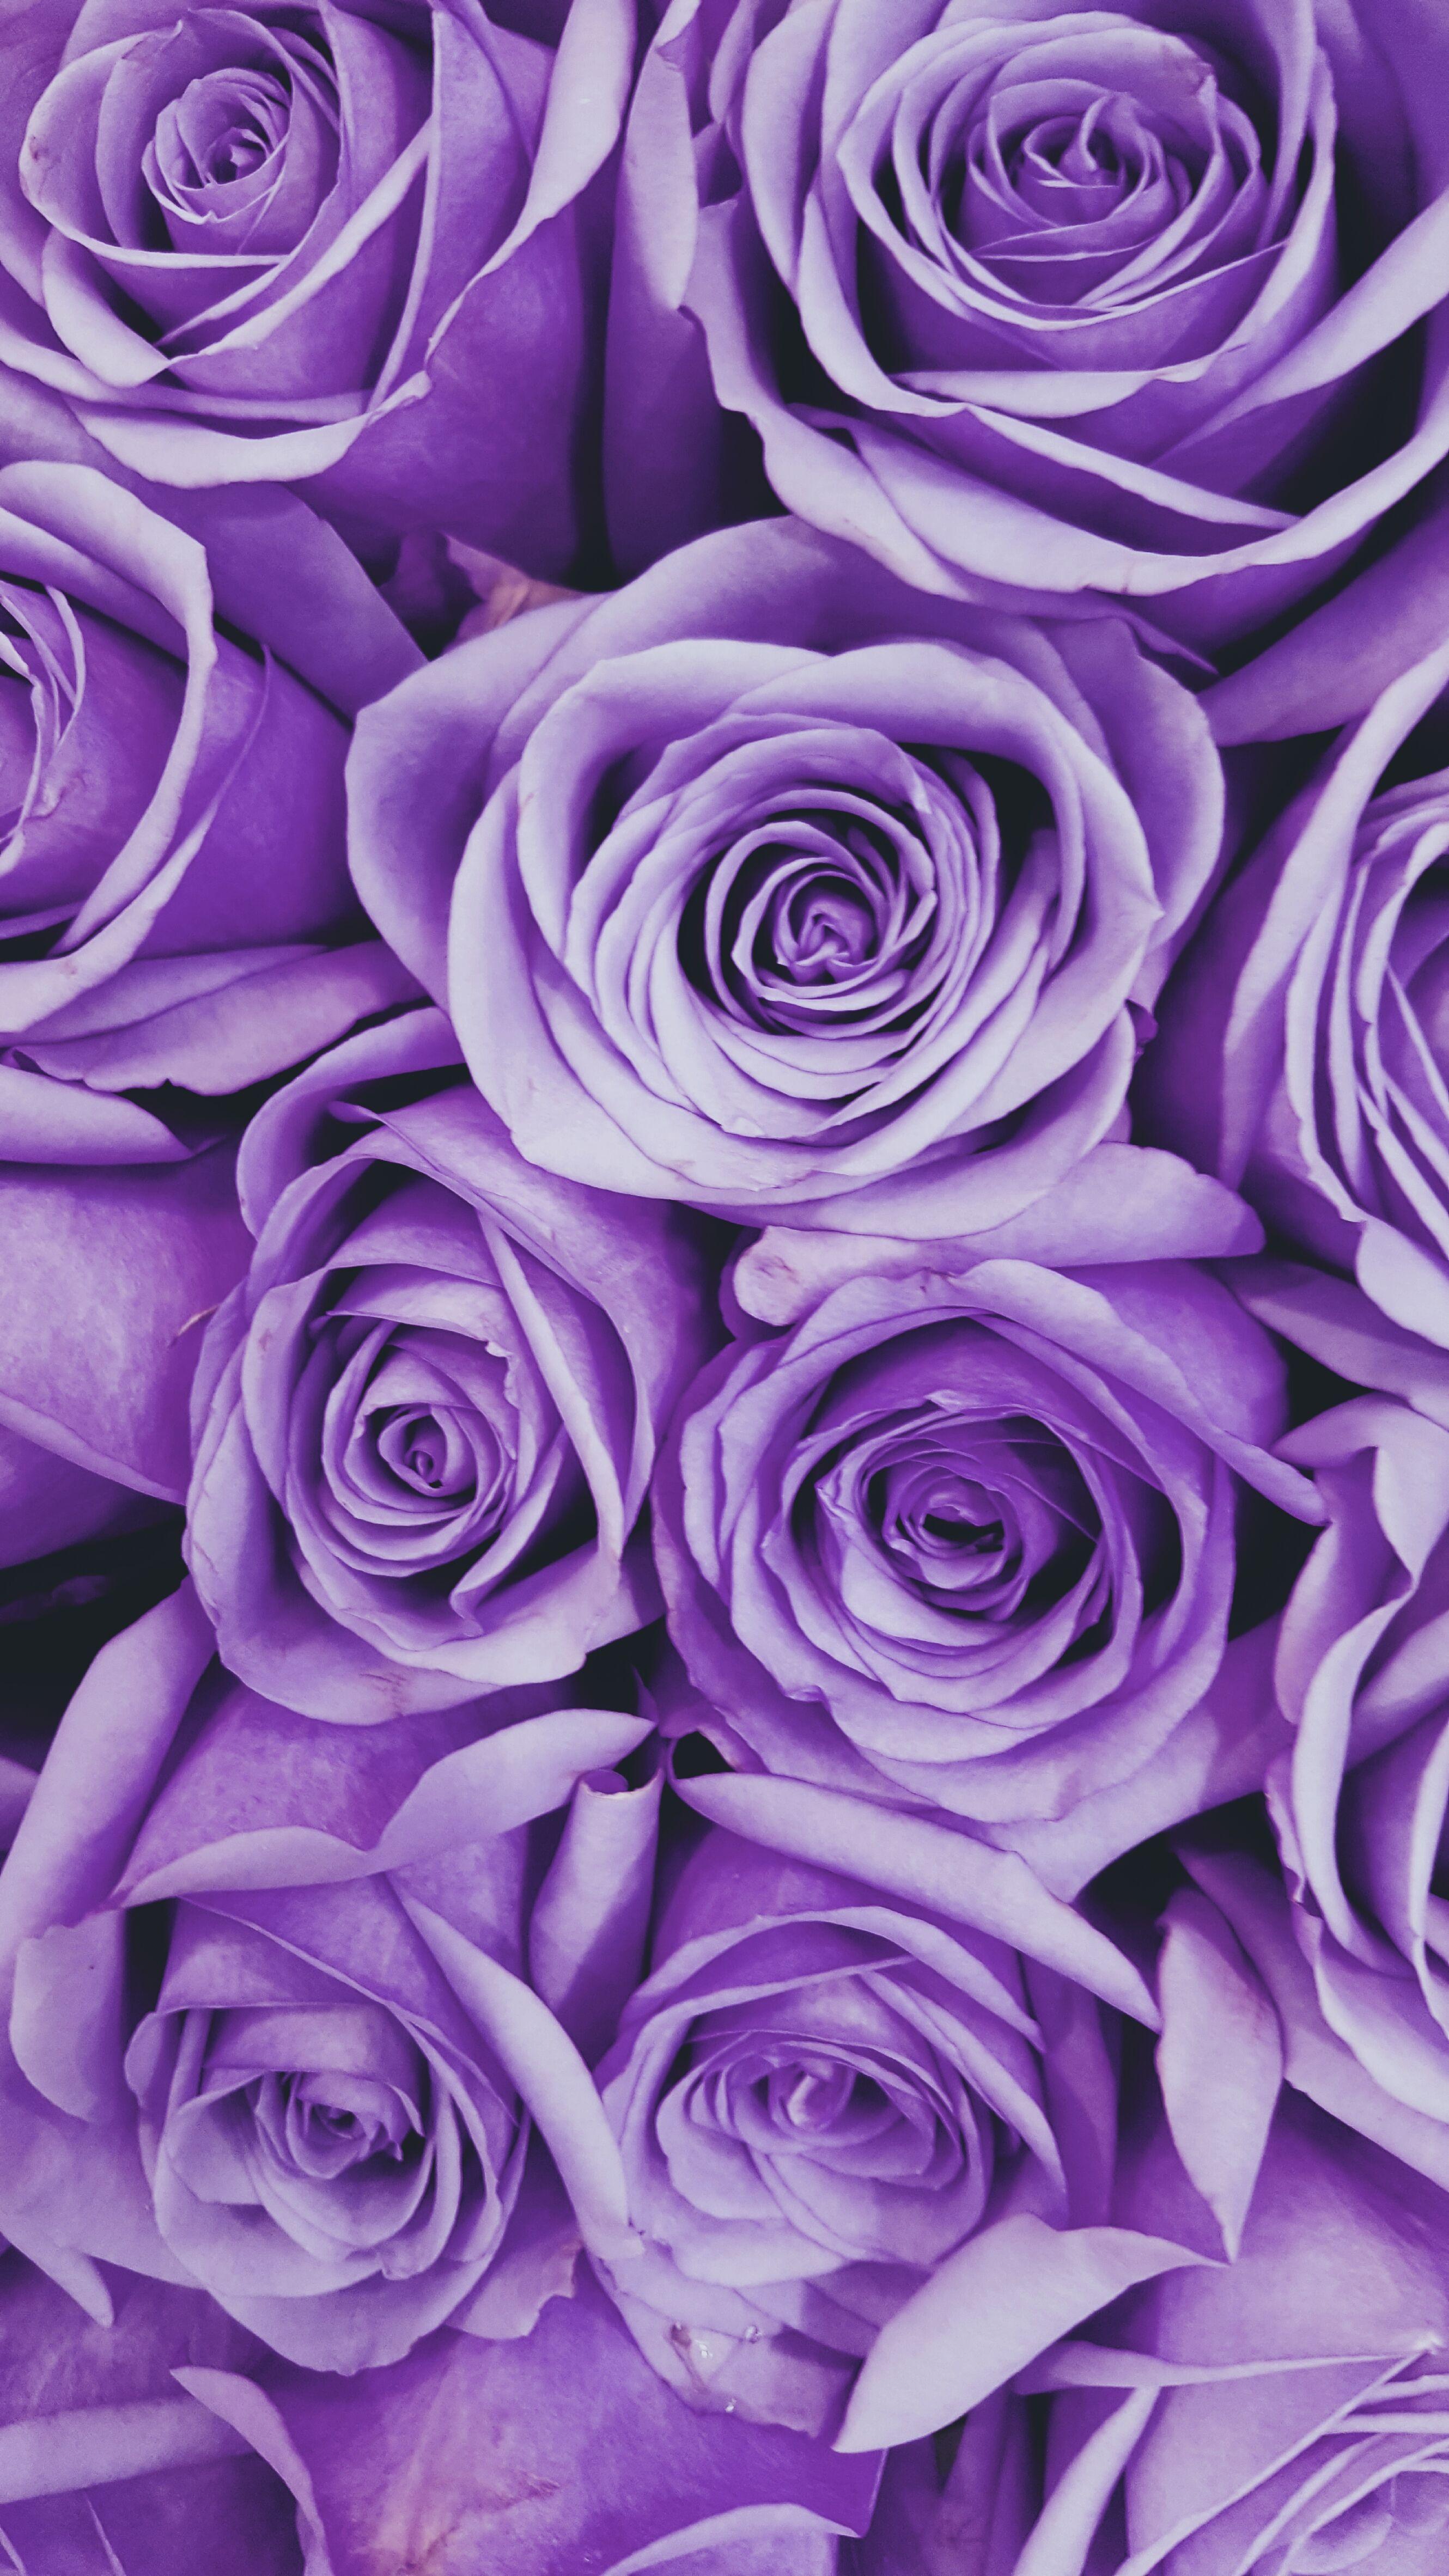 Purpleflowers Floralart Textileart Textiledesign Athomestores Artforsale Roseart C Purple Flowers Wallpaper Purple Aesthetic Purple Wallpaper Iphone Amazing light purple flower wallpaper